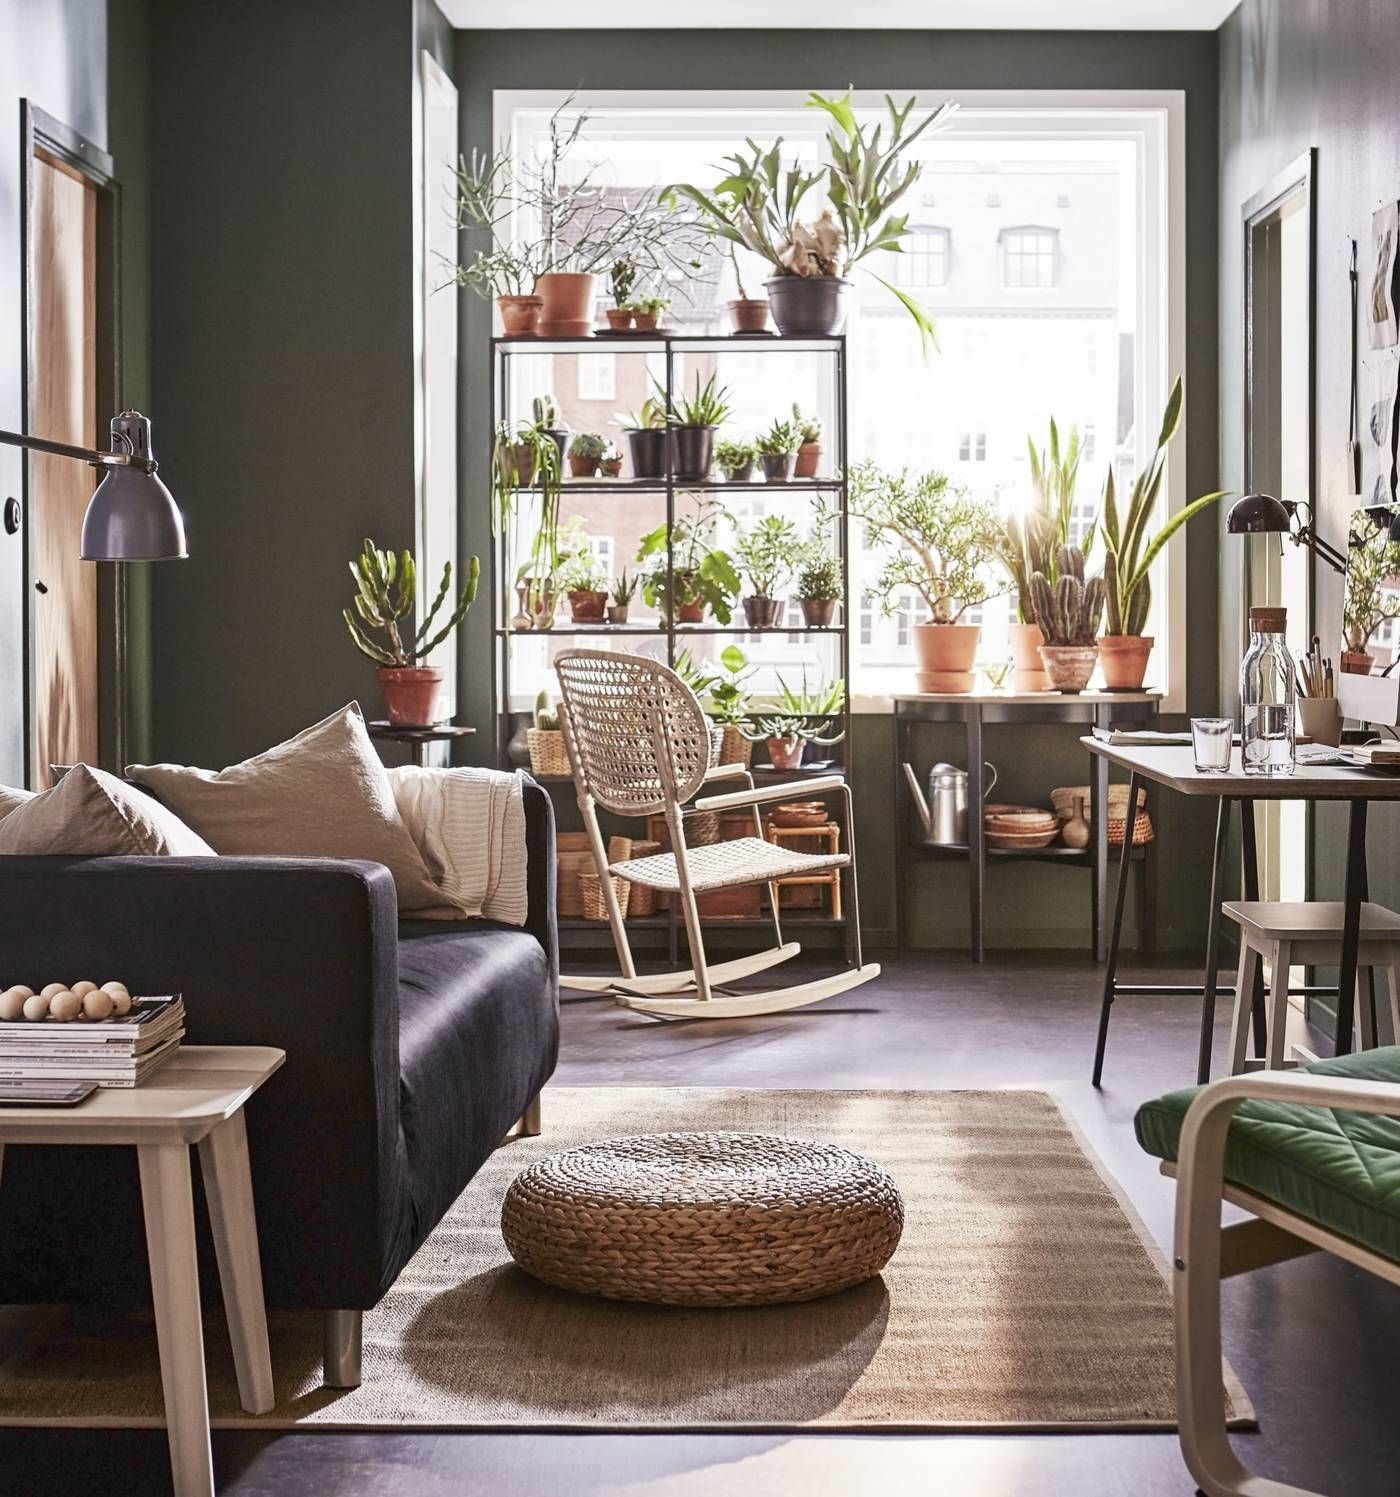 GRÖNADAL Rocking chair - IKEA | FURNITURE {LIKES} | Pinterest